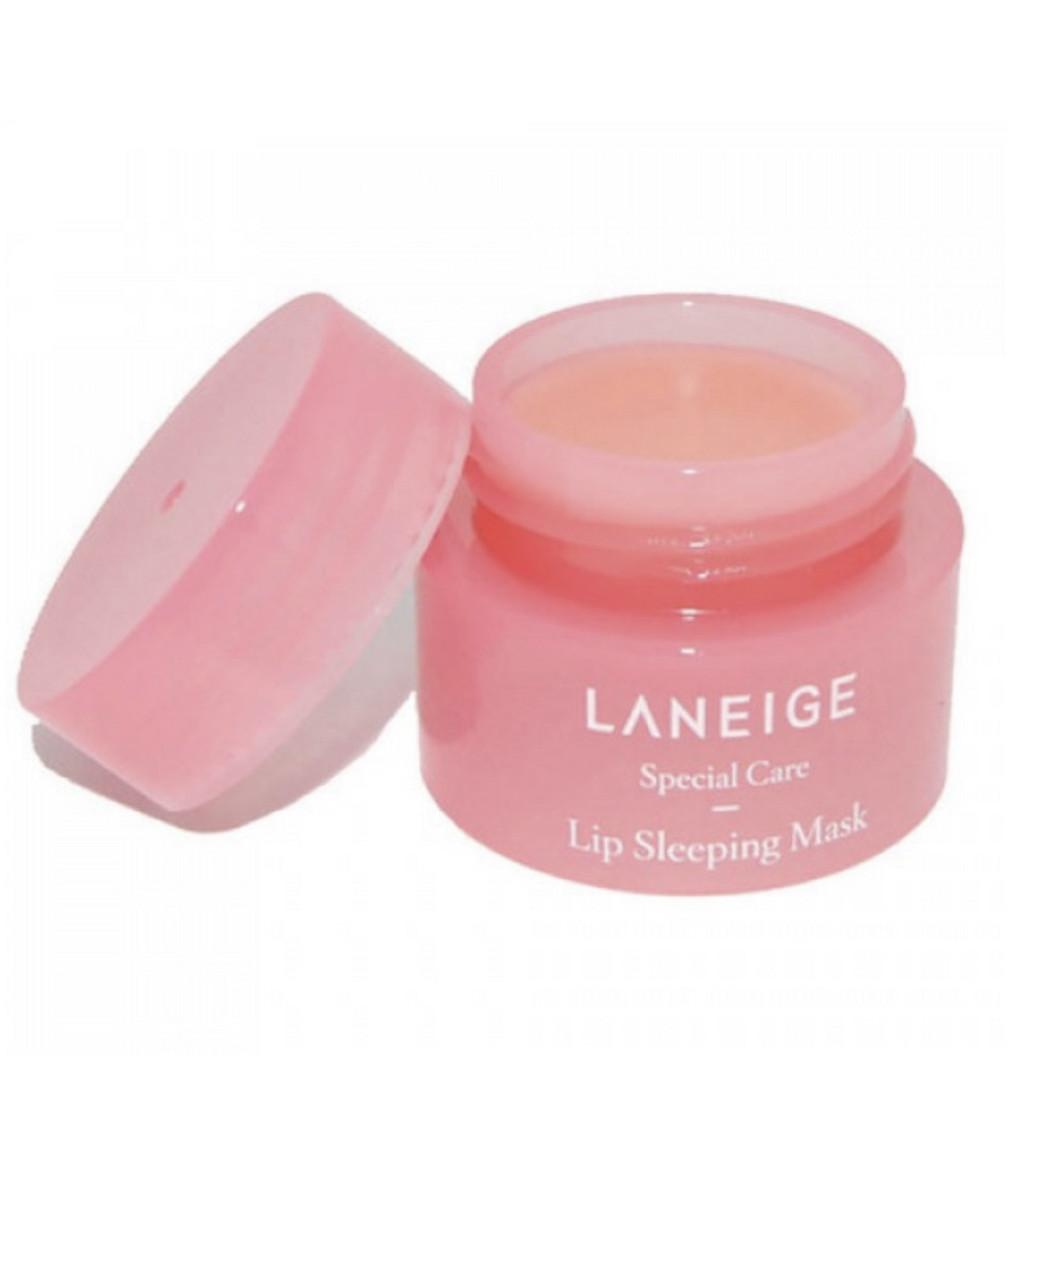 Нічна маска для губ LANEIGE Lip Sleeping Mask 3g